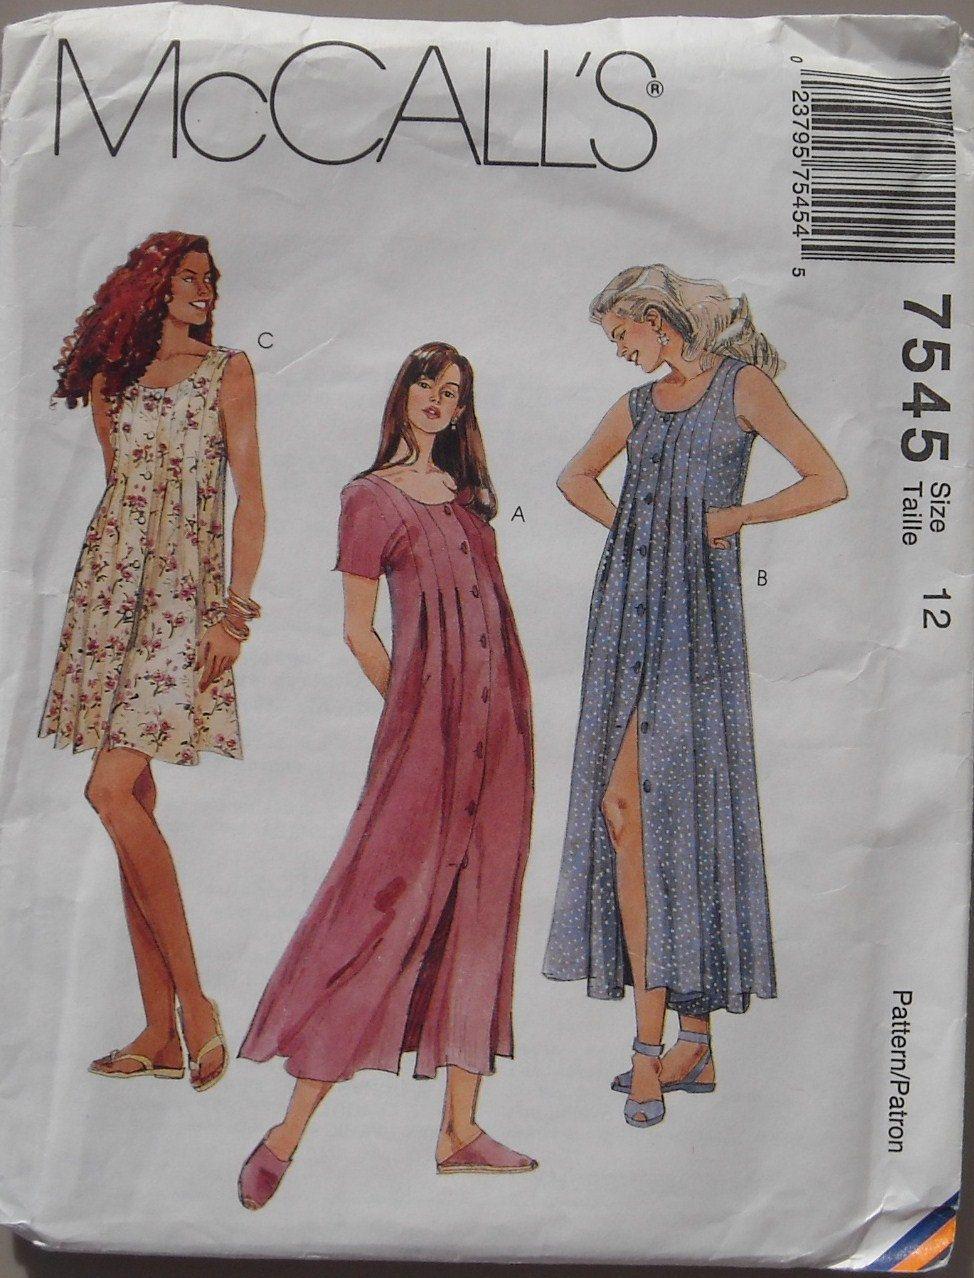 Mccalls 7545 90 S Dress Misses Size 12 Uncut 4 95 Via Etsy I Miss 90s Fashion Trendy Sewing Patterns Sewing Pattern Sizes Vintage Dress Patterns